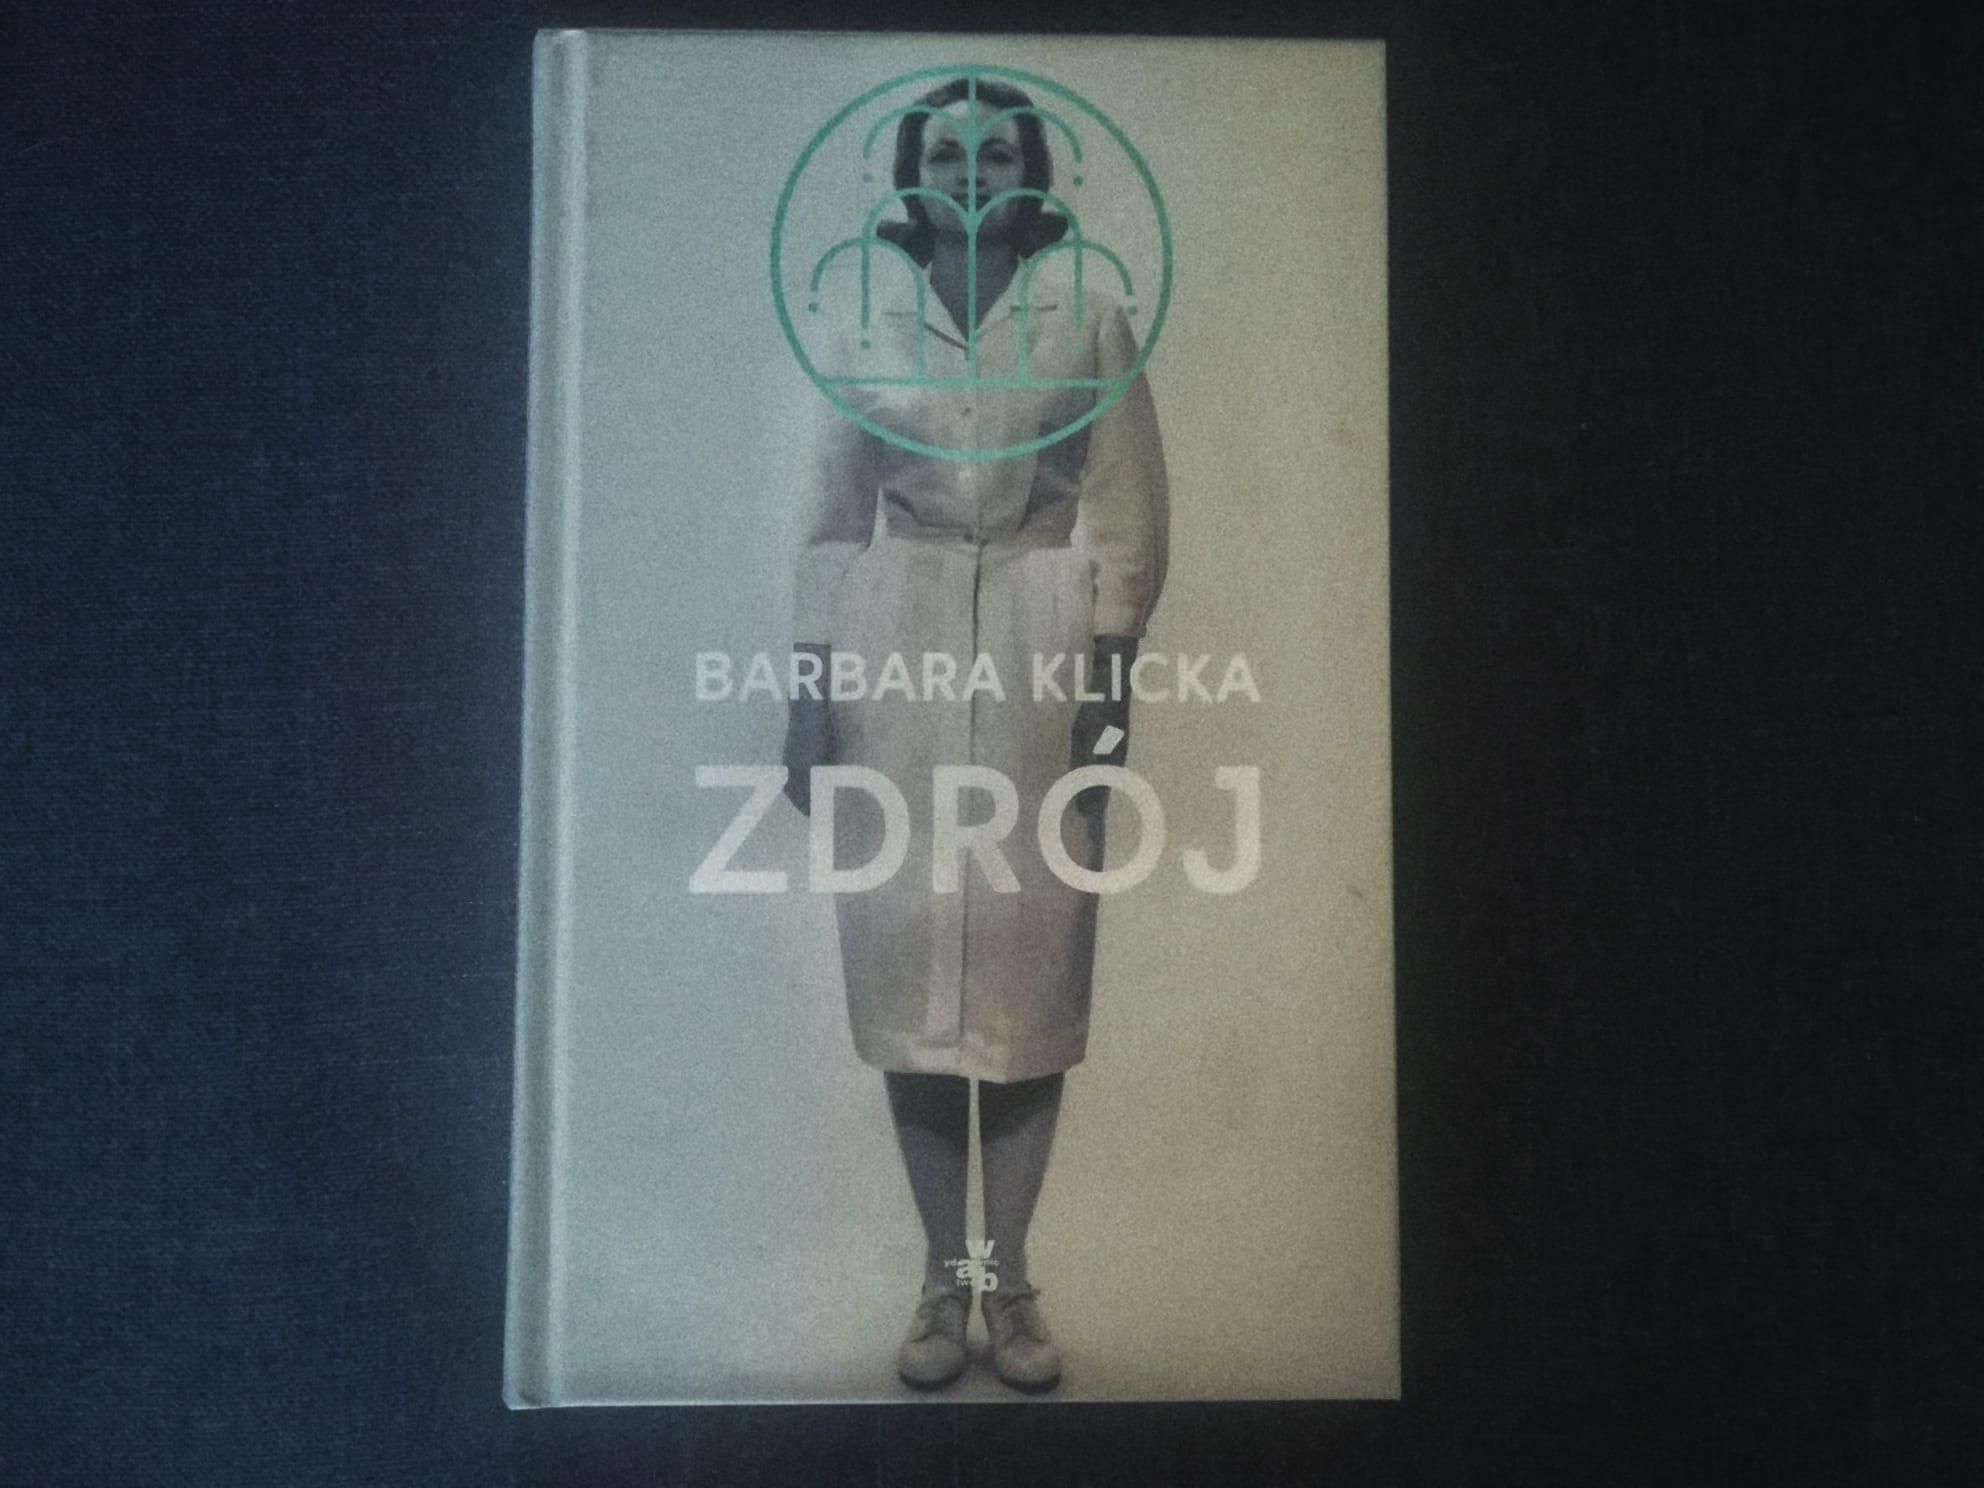 Zdrój Barbara Klicka